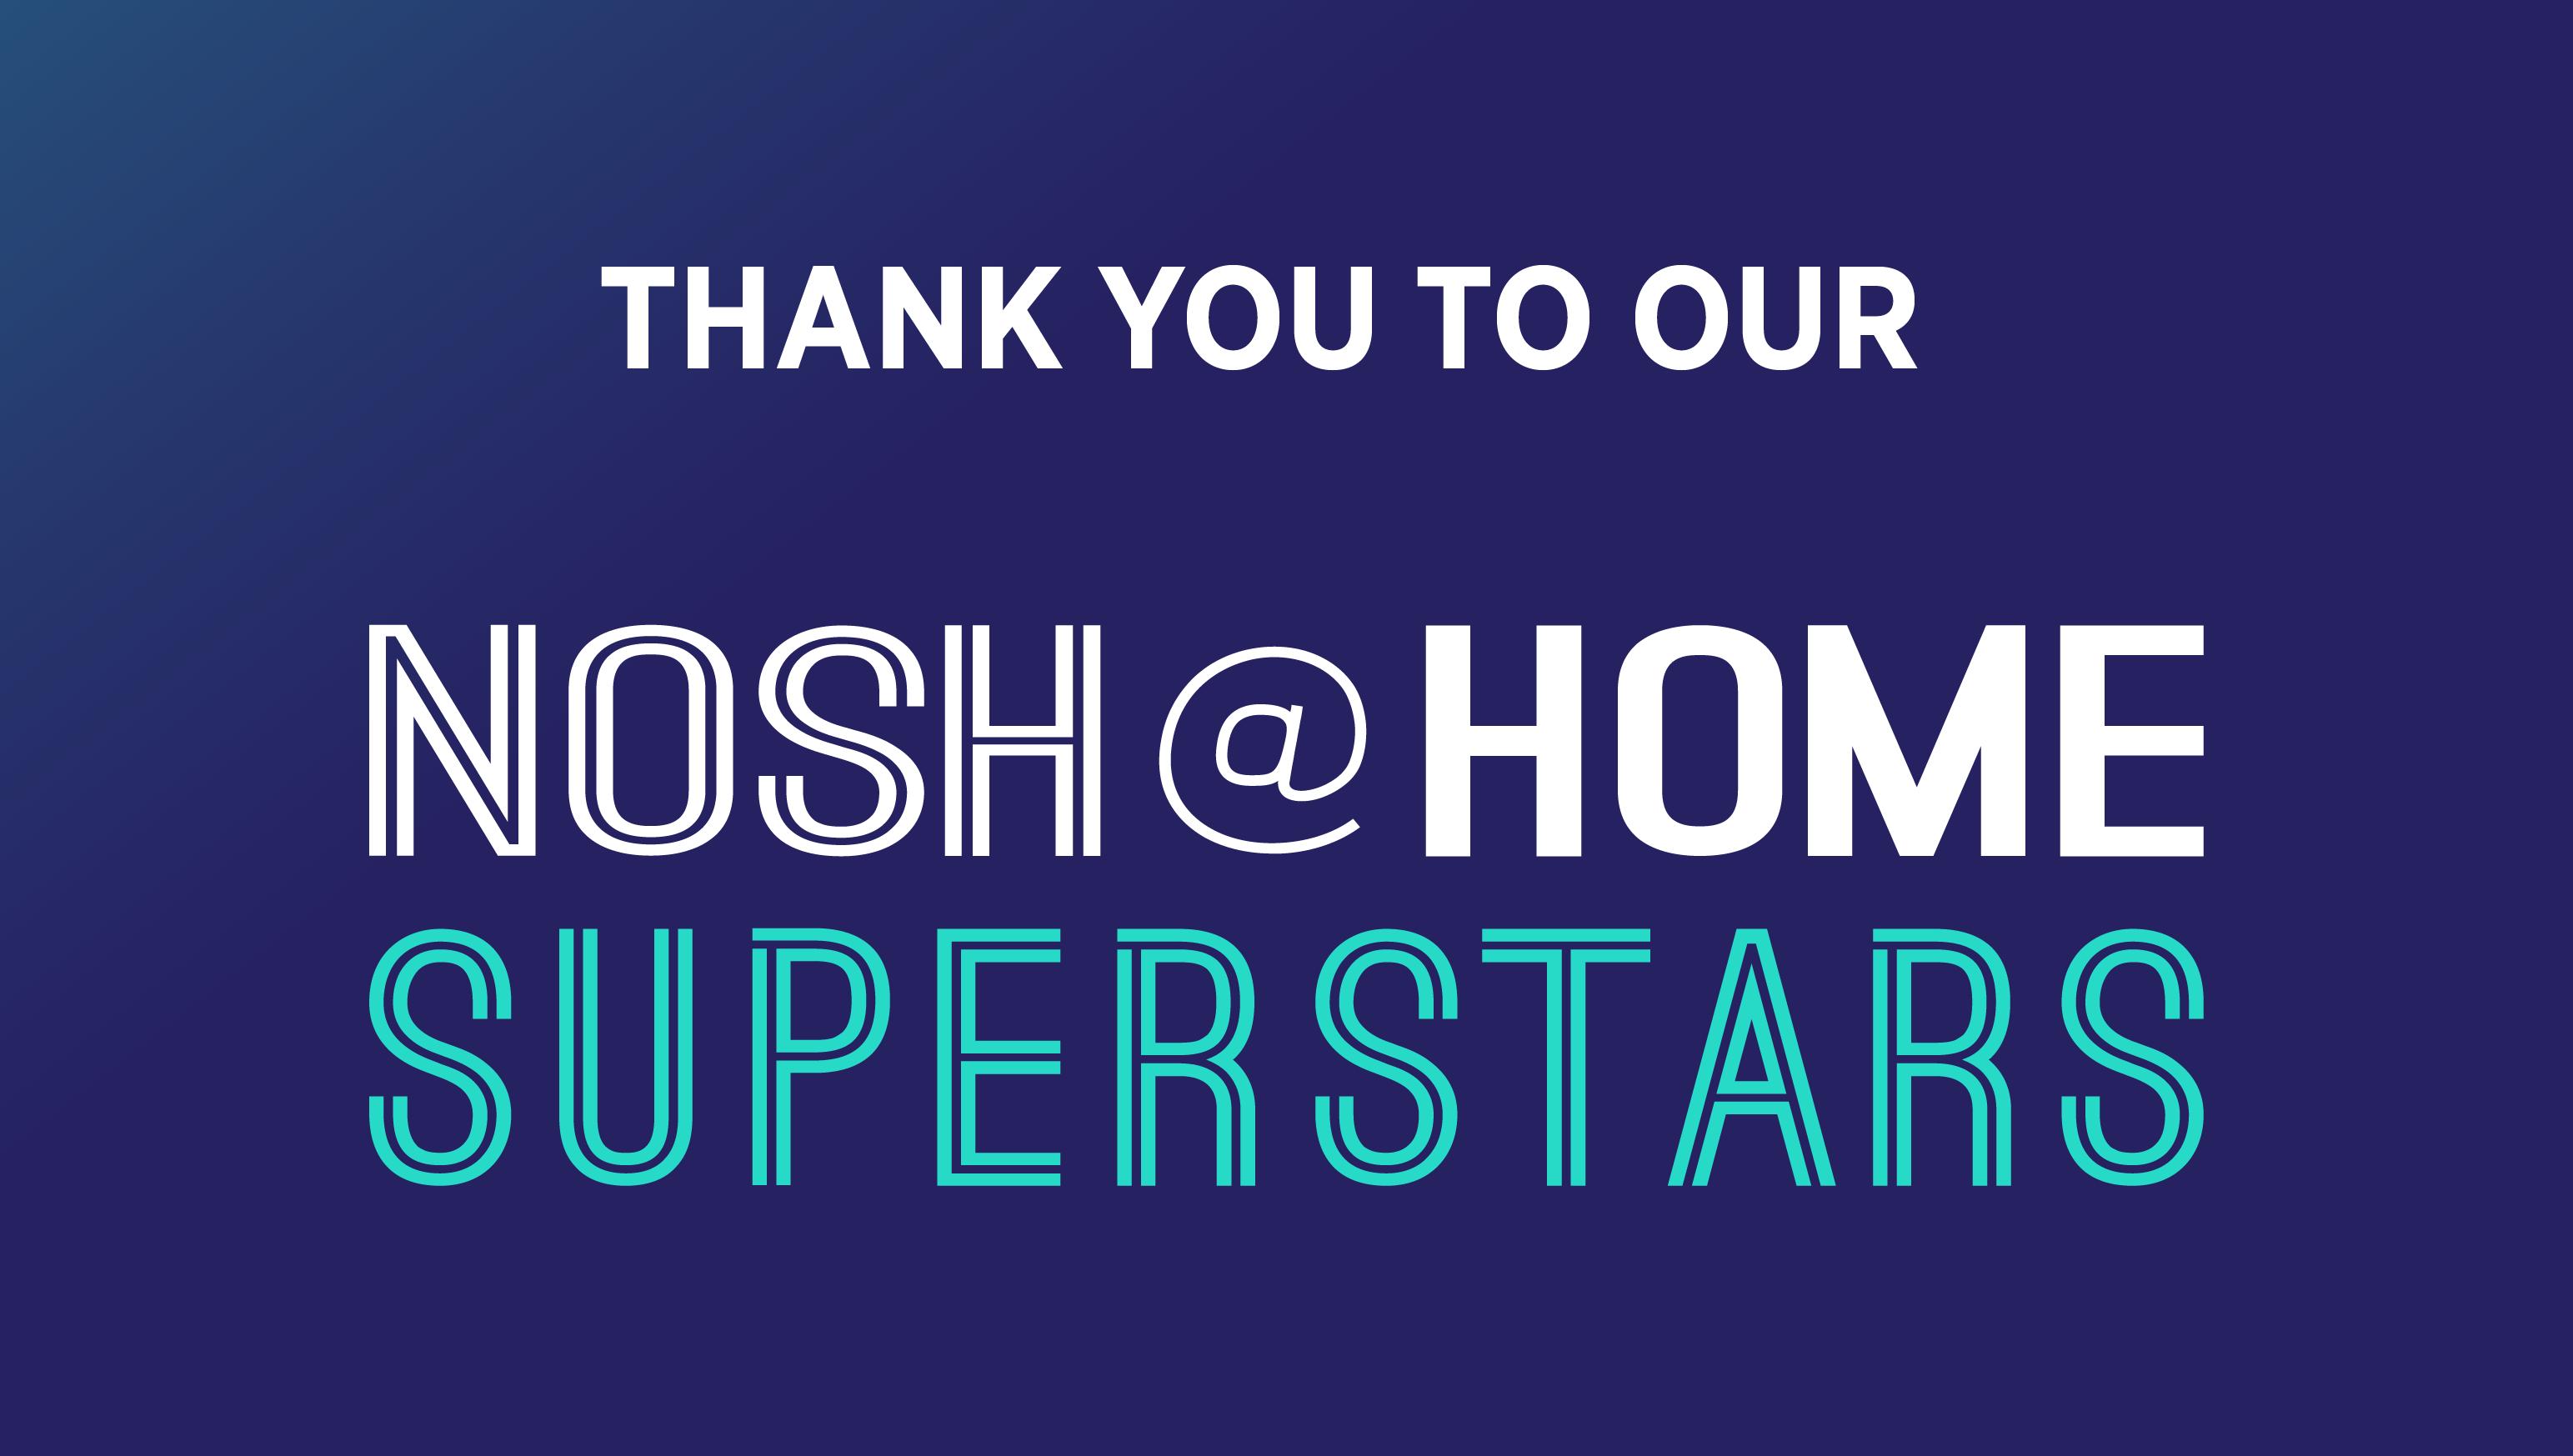 Thank you to Nosh Superstars-72